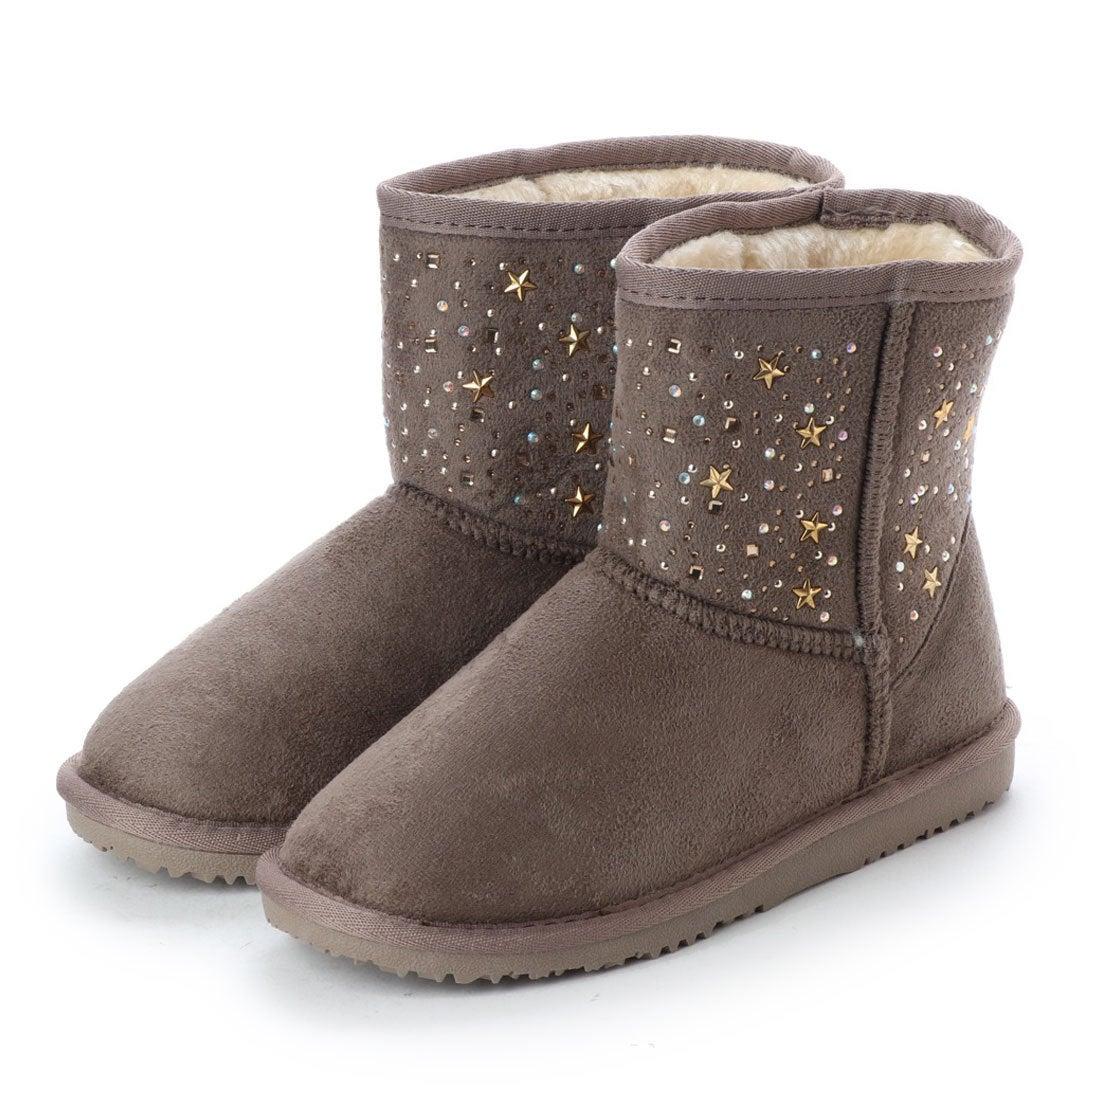 5be7989716c73 ベティーキッズ Betty Kids BK-37001 (OAK) -靴&ファッション通販 ロコンド〜自宅で試着、気軽に返品